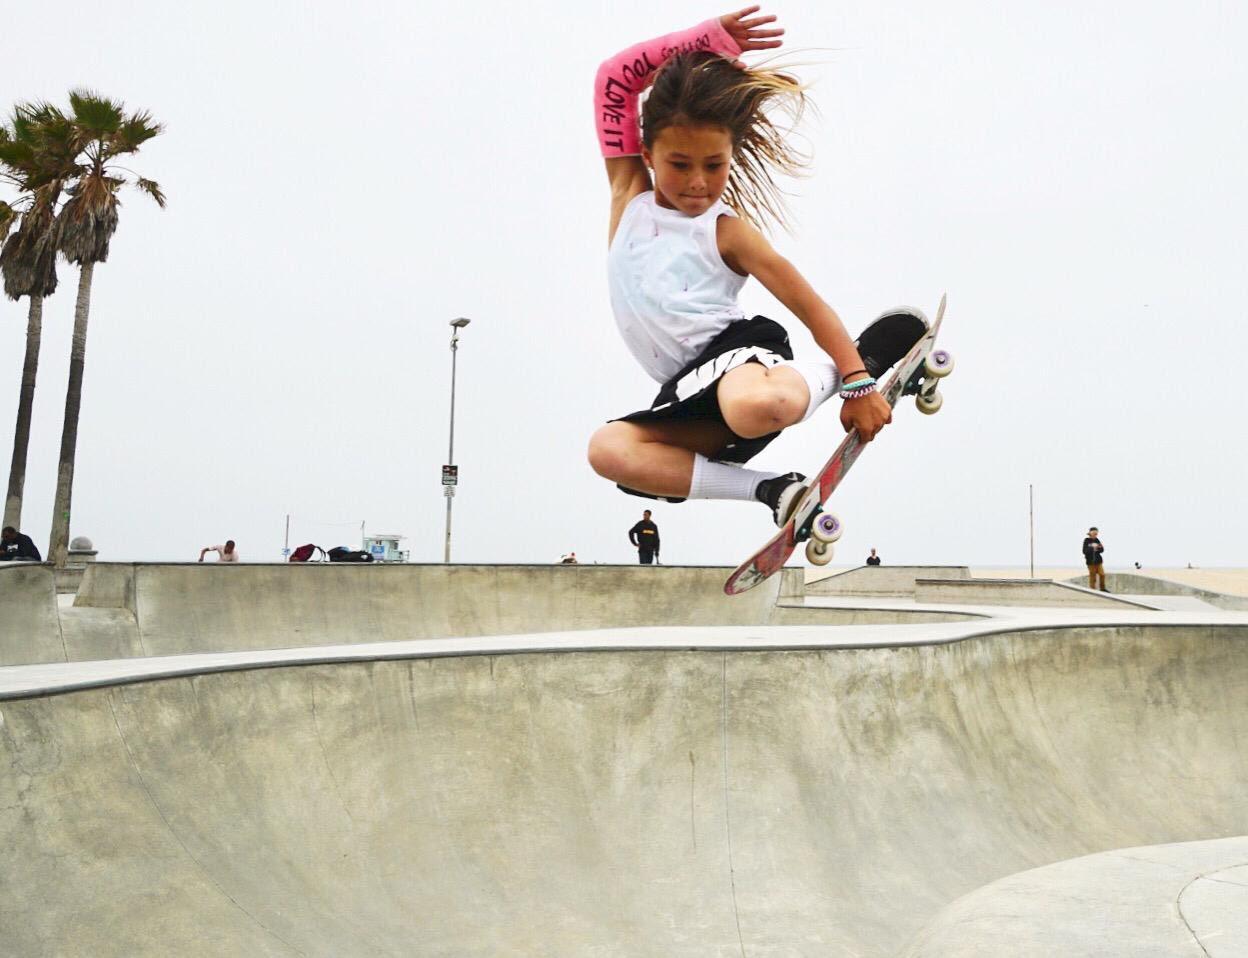 Sky-Brown-June19-CR-Skateboard-GB.jpg